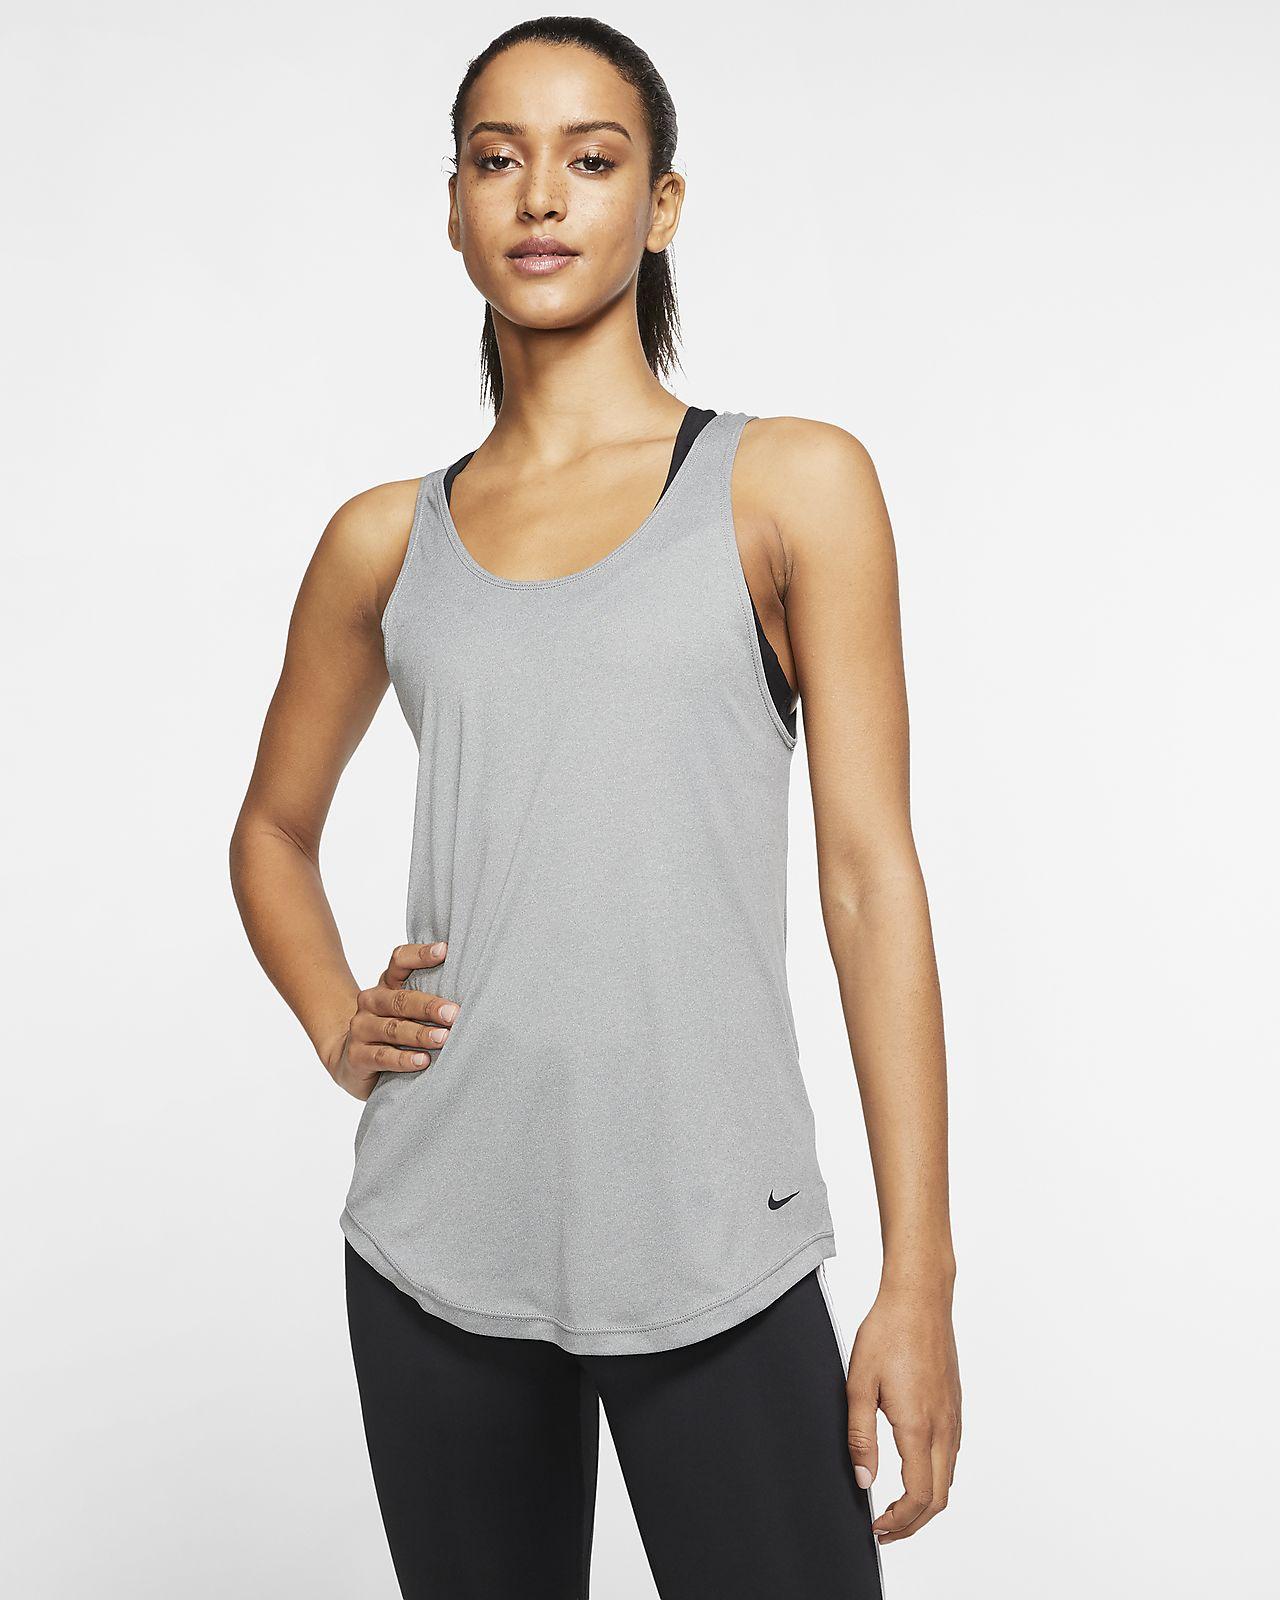 Nike Dri FIT Trainingstanktop für Damen